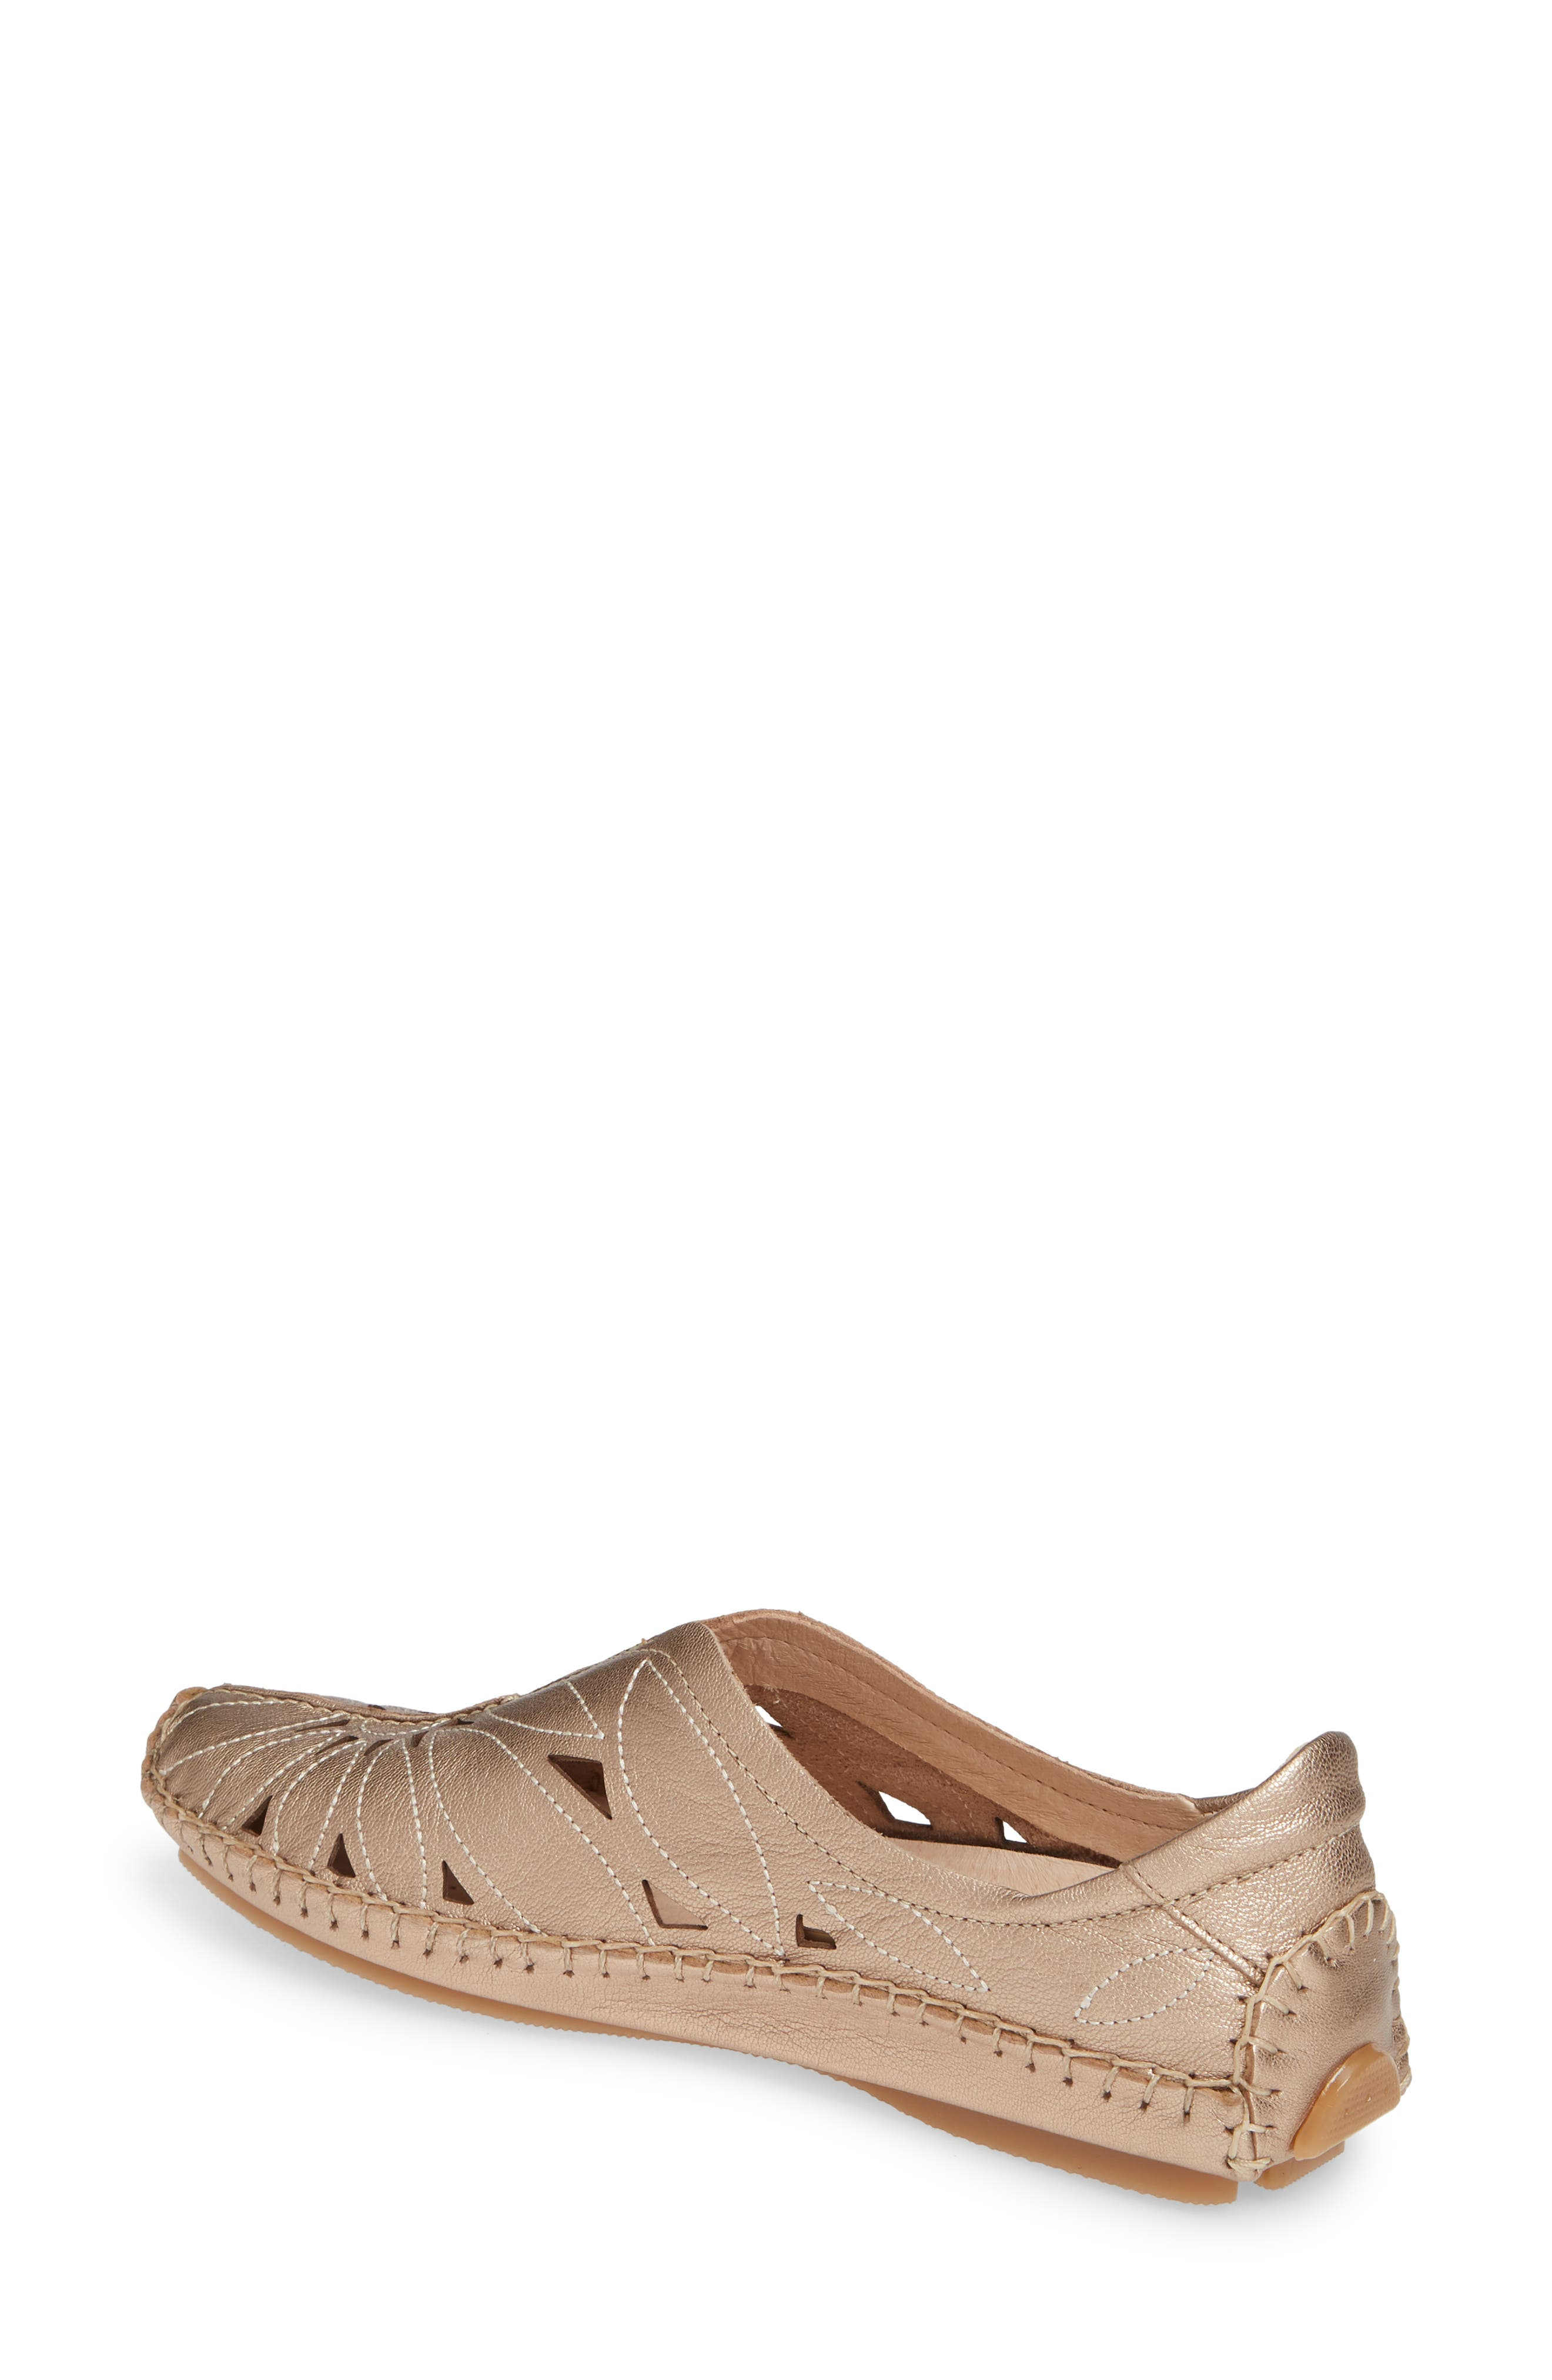 860b20f2b9a Women s PIKOLINOS Shoes